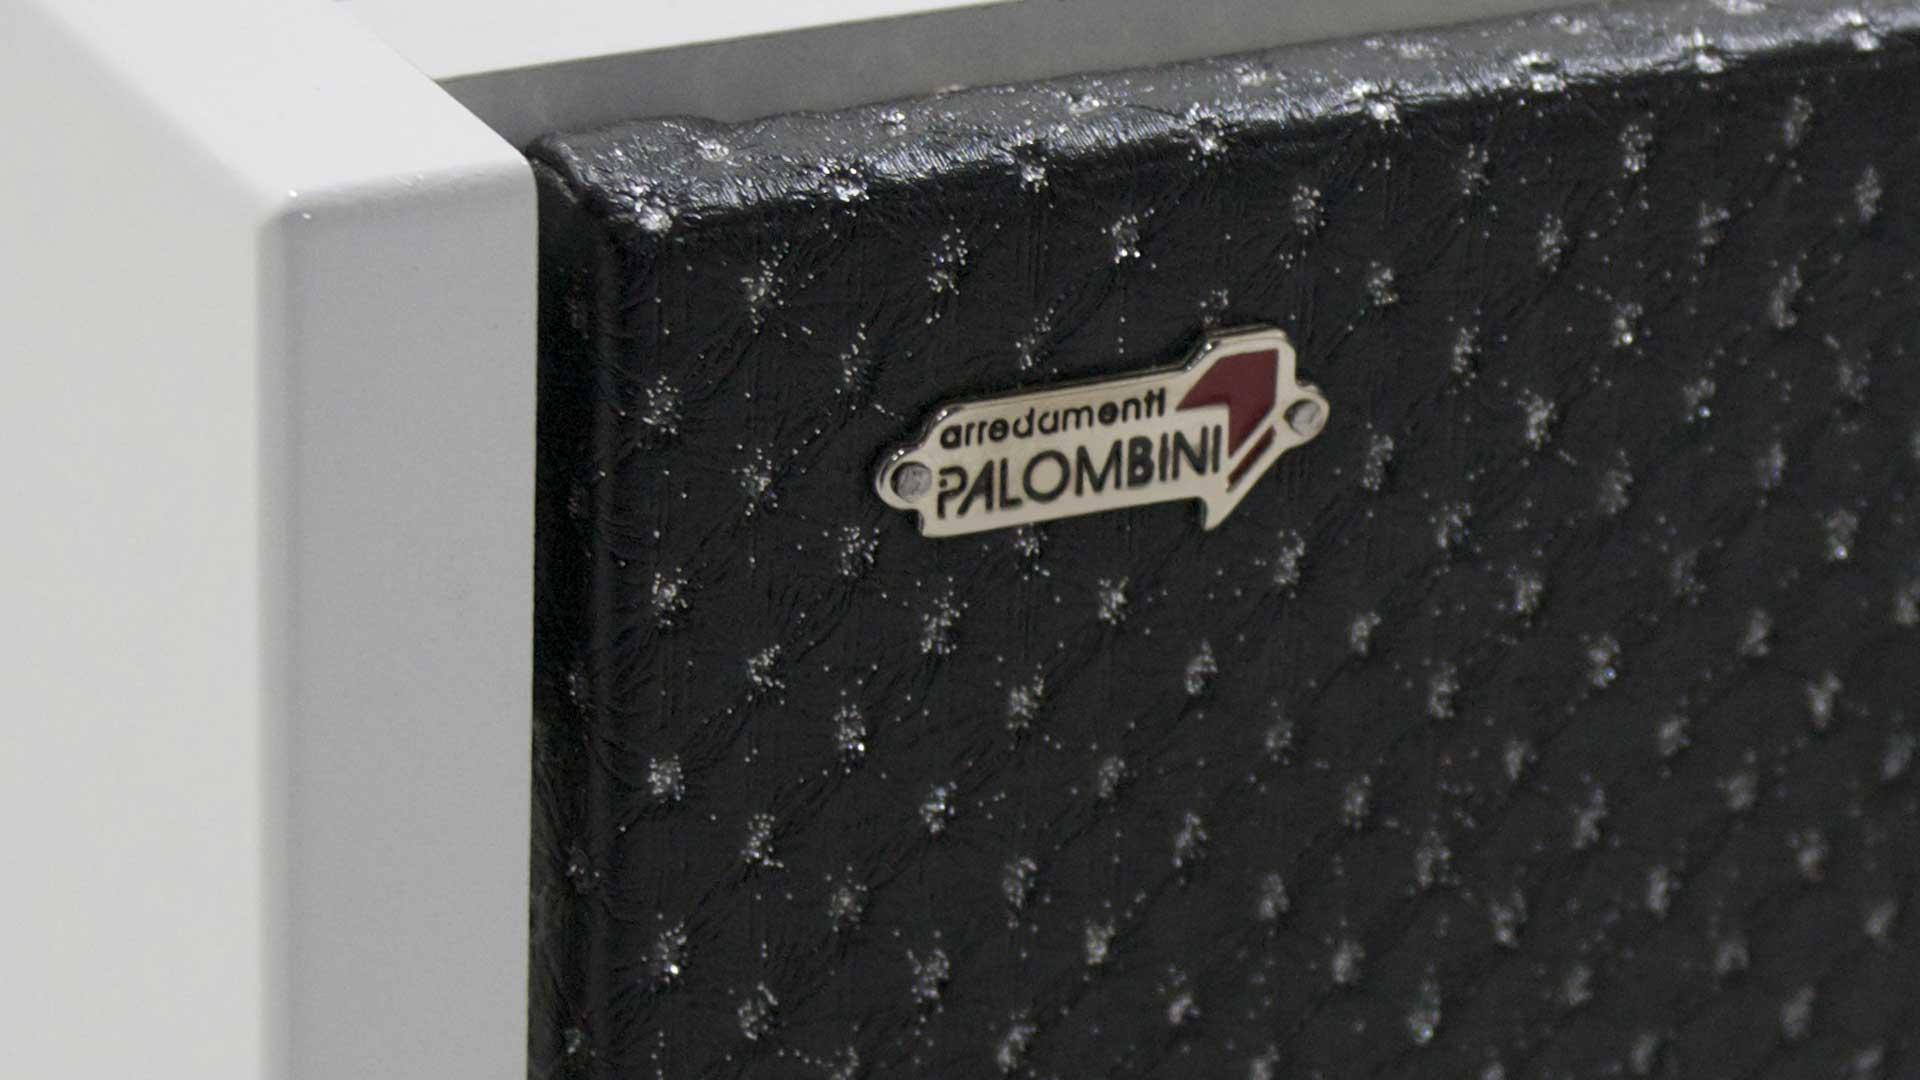 palombini arredamenti - azienda - Arredo Bagno Palombini